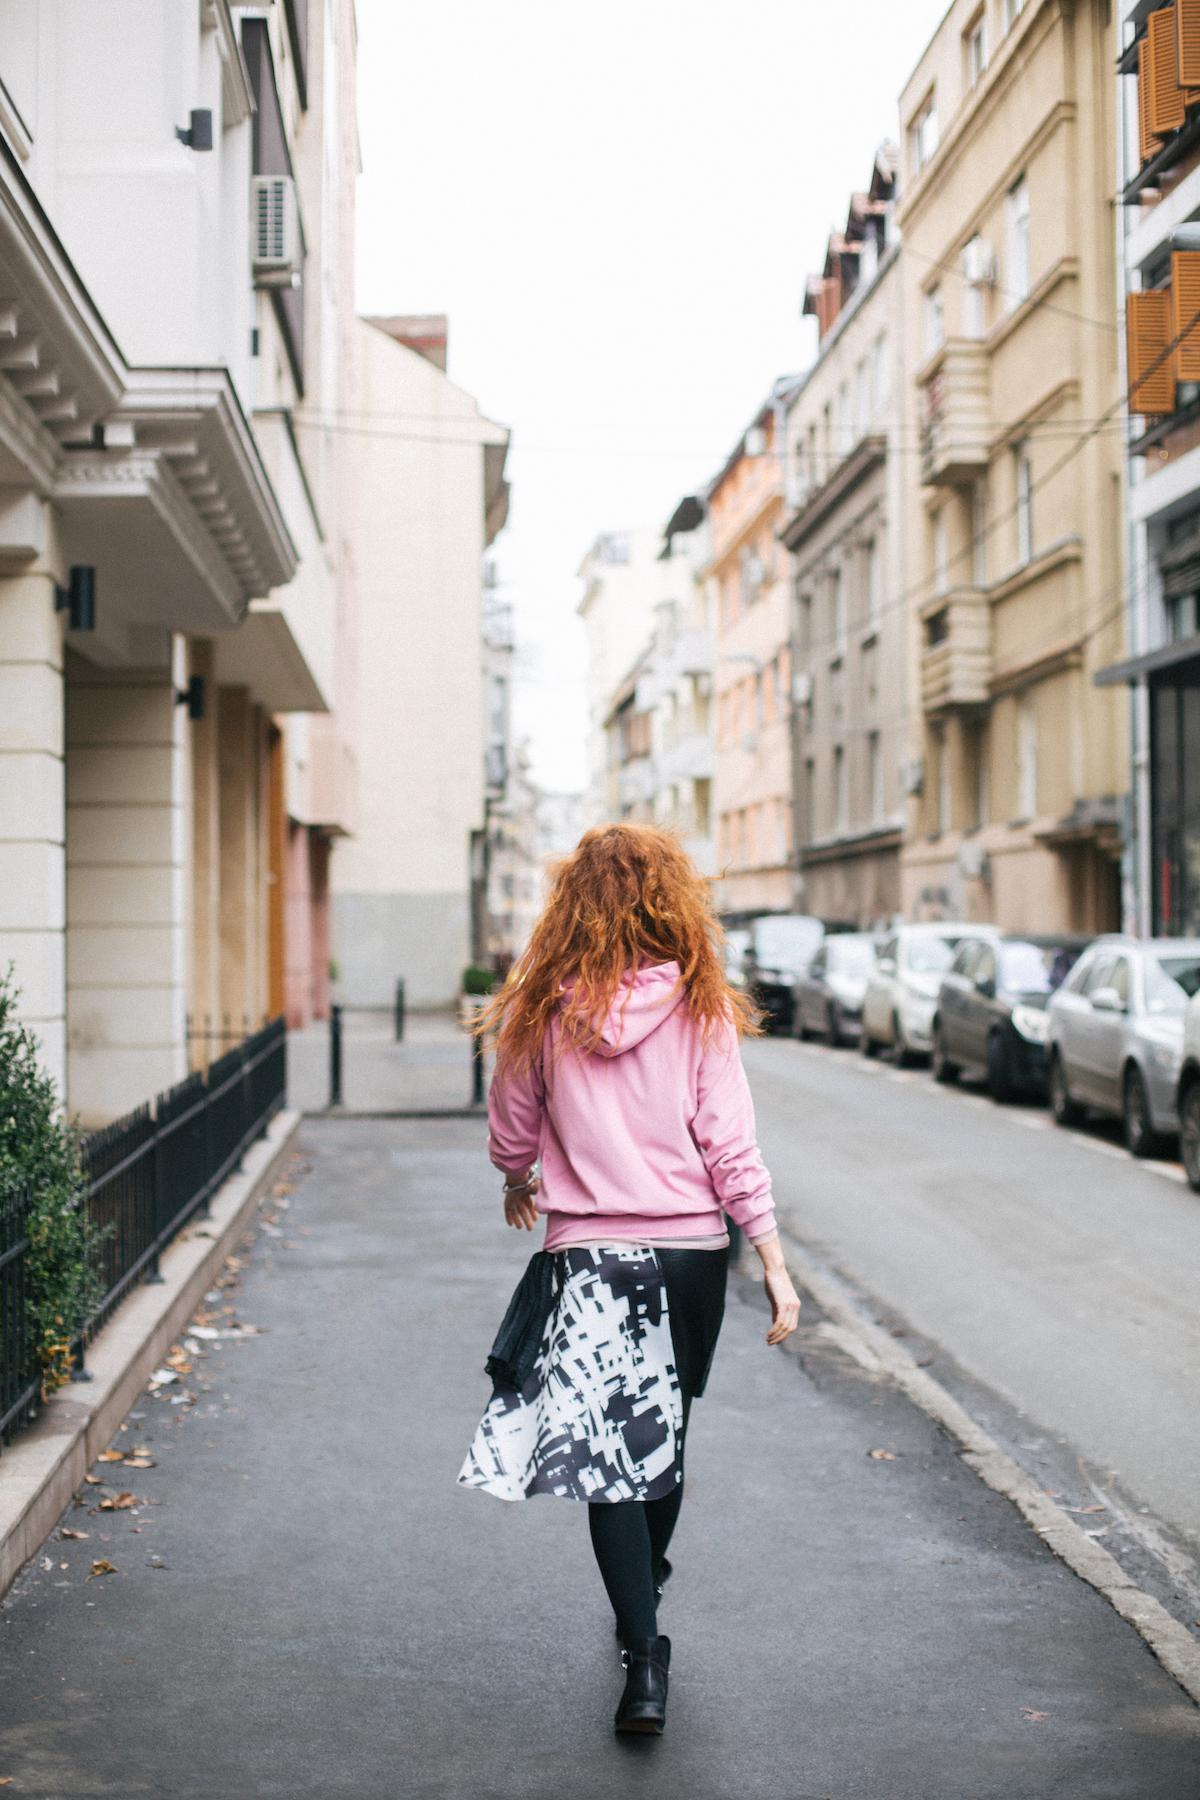 Beograd red hair Beutyfullblog foto jovana Tomasevic